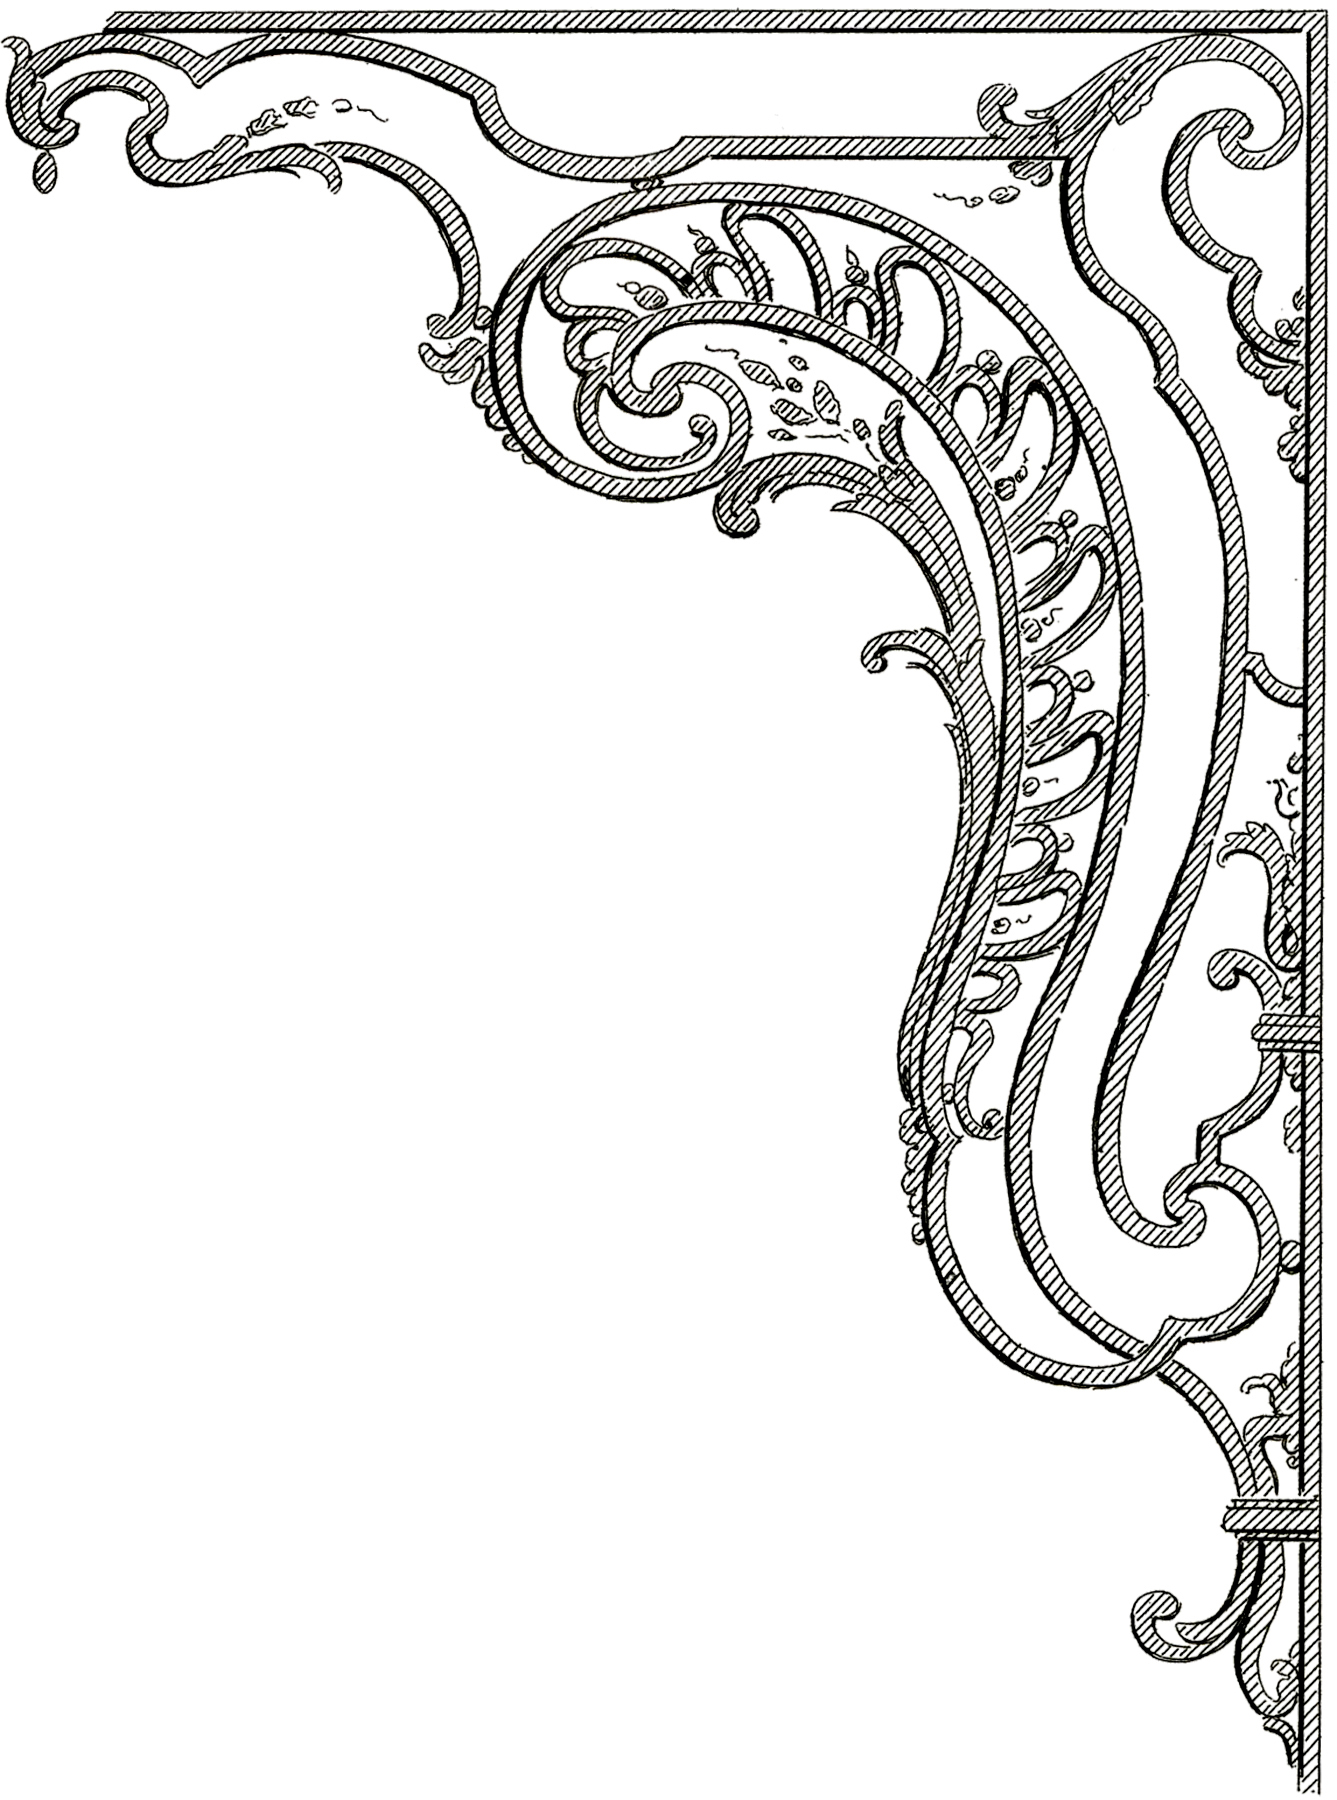 French Corner Ornaments - Vintage Corner Ornament - HD Wallpaper